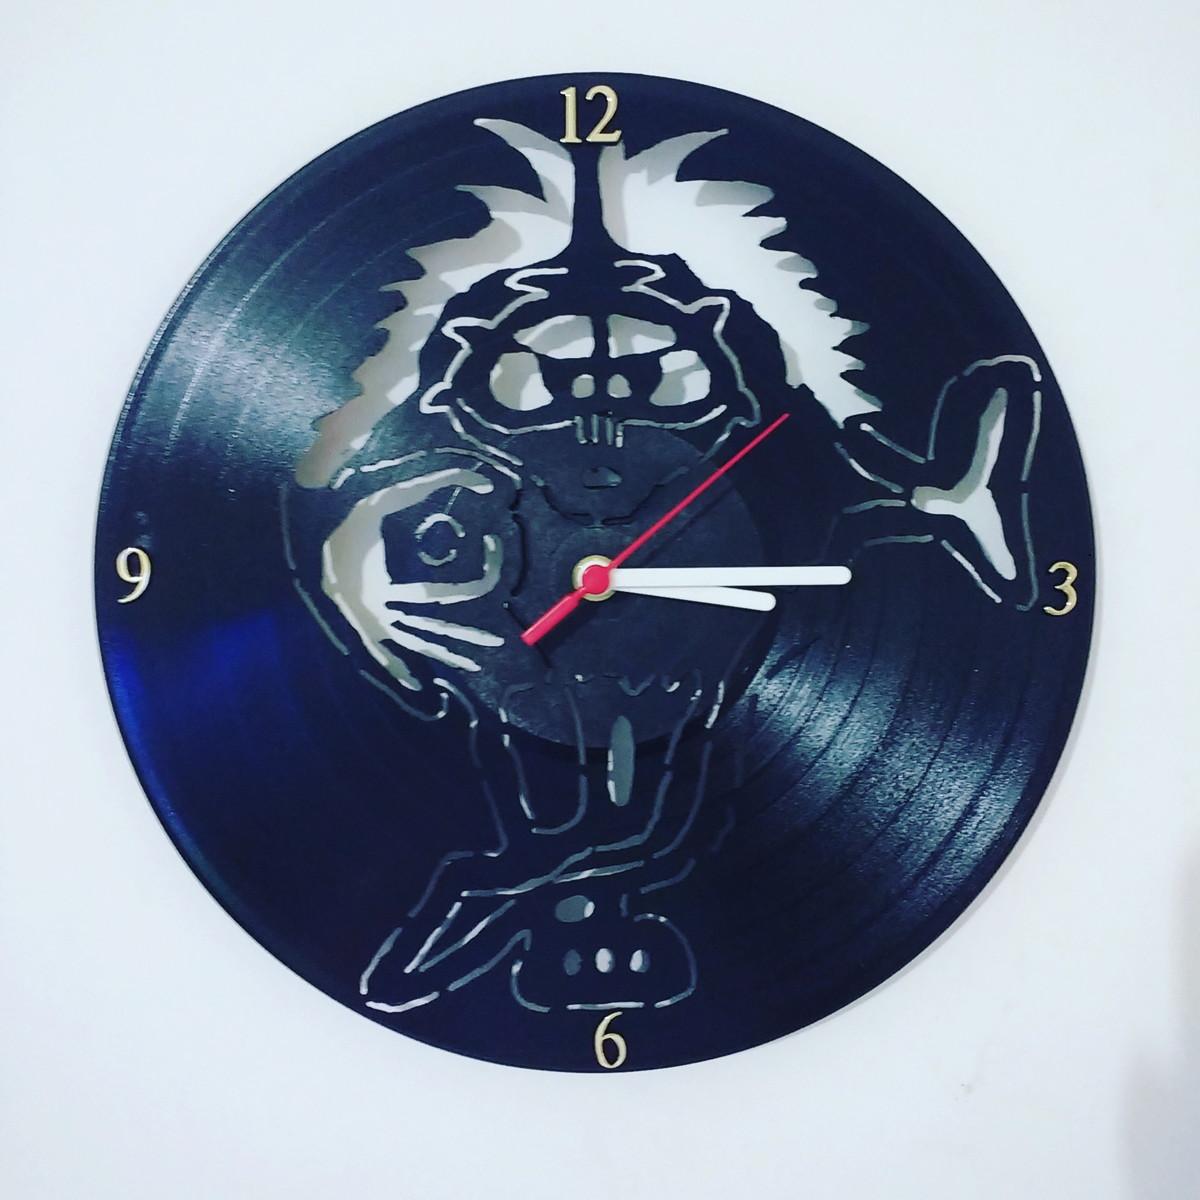 18c86bd6961 Relógio Vintage - série futebol brasileiro - Galoucura no Elo7 ...